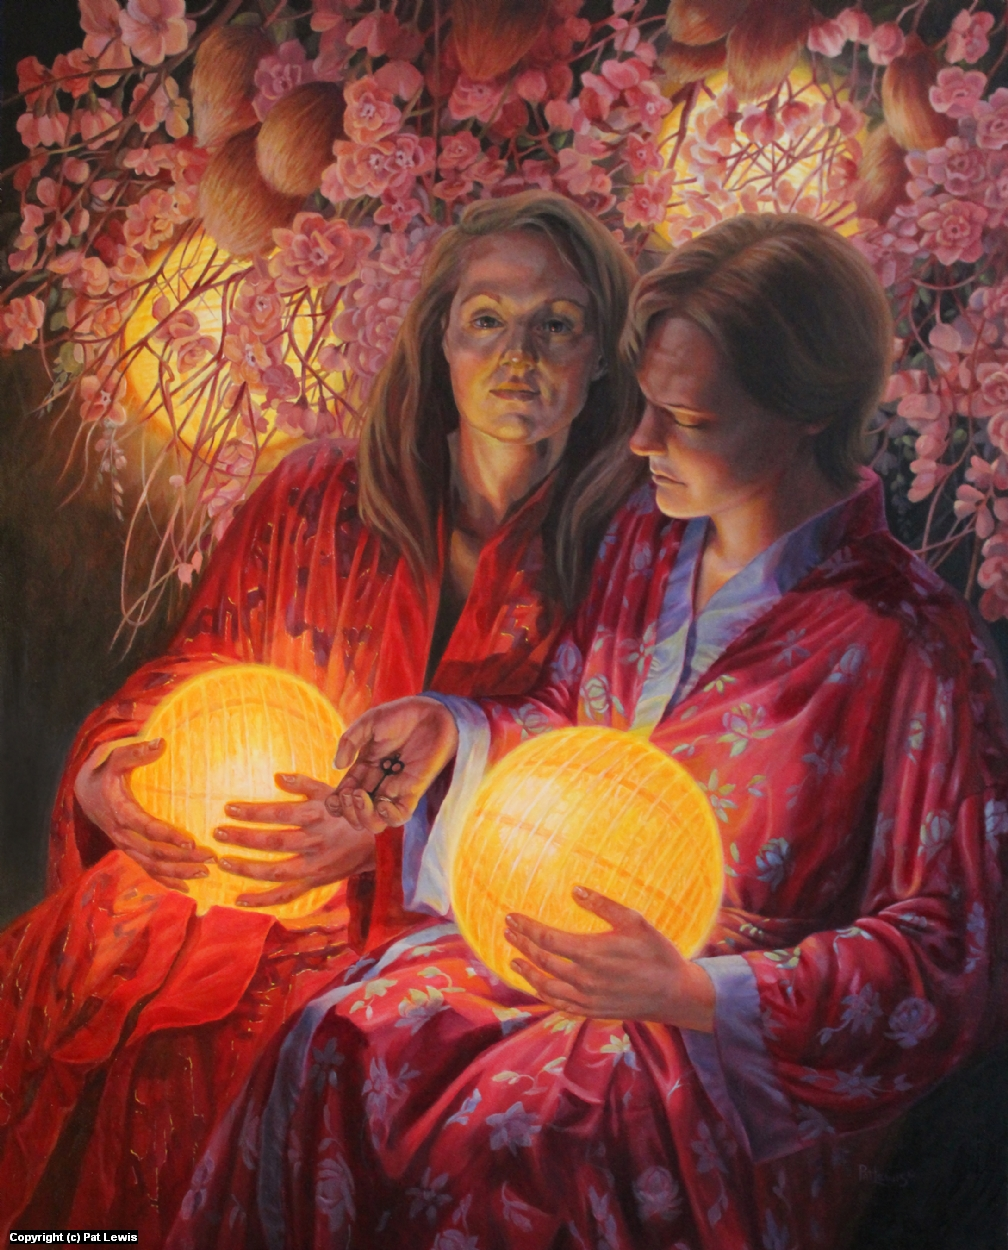 Secrets in the Garden Artwork by Pat morrissey-Lewis